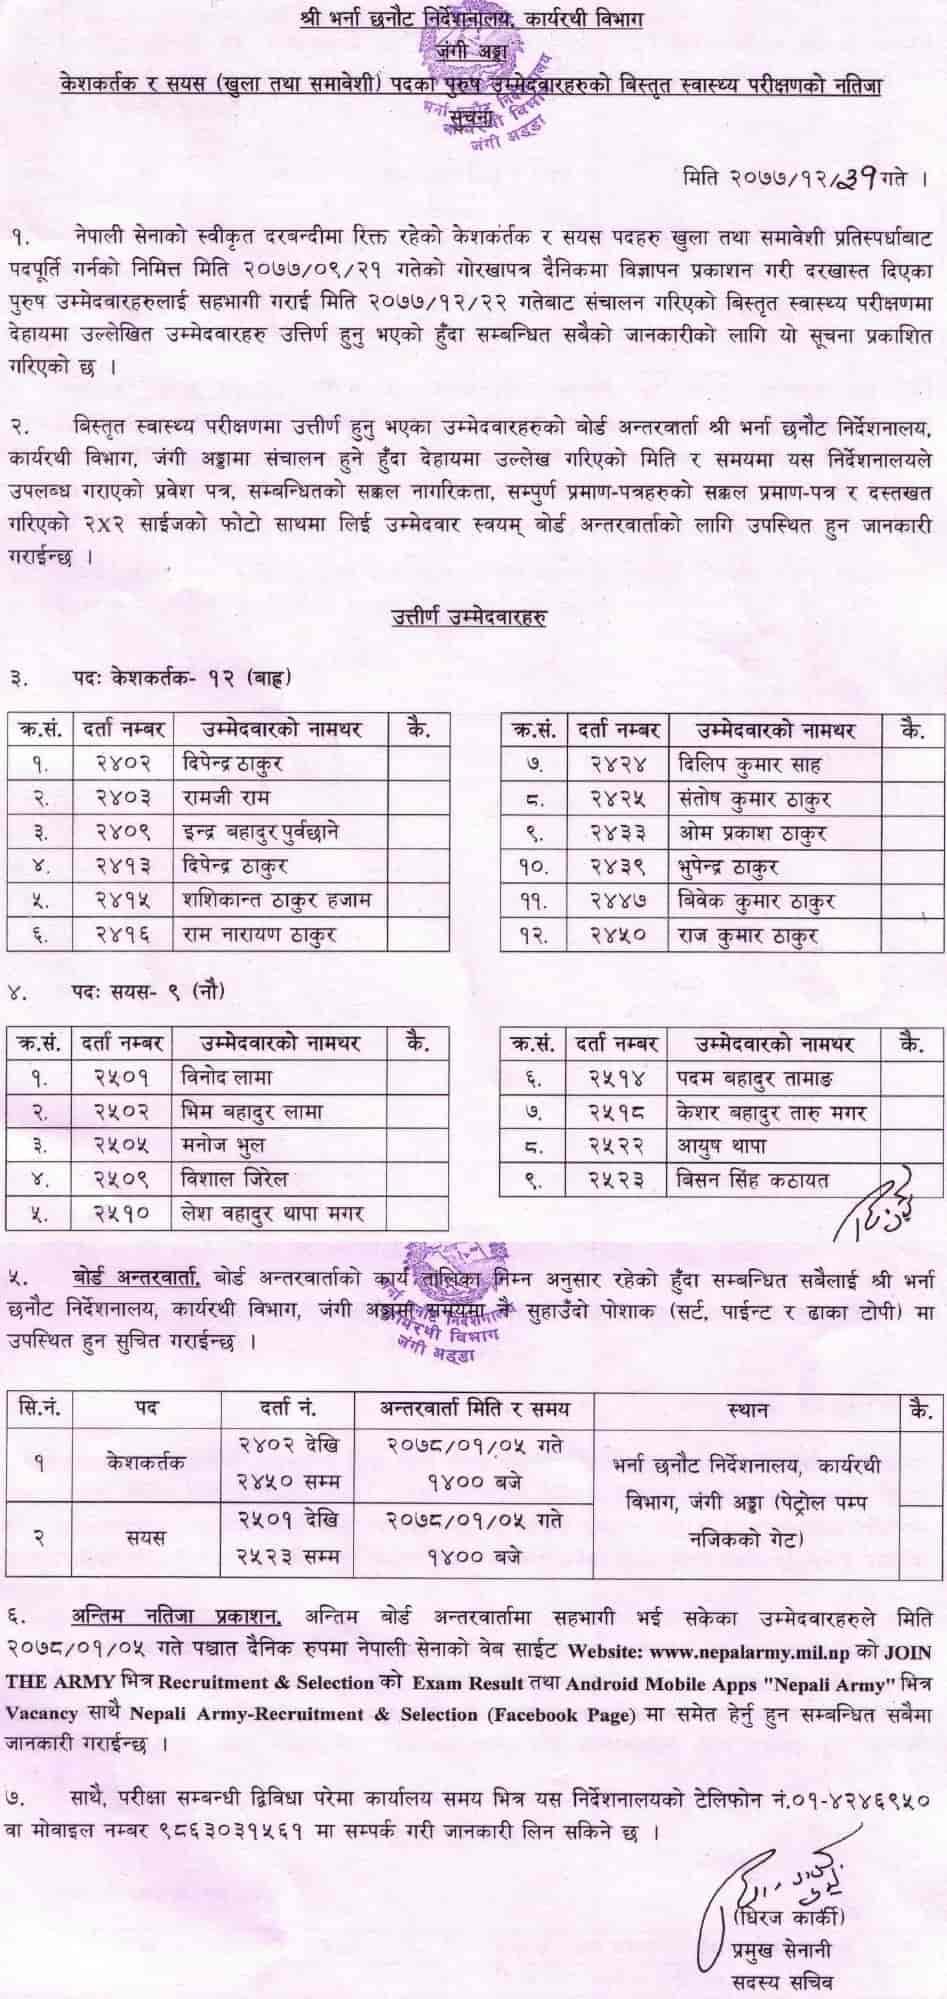 Nepal Army Keshkartak and Sayes Detailed Medical Examination Result (Male Candidates)